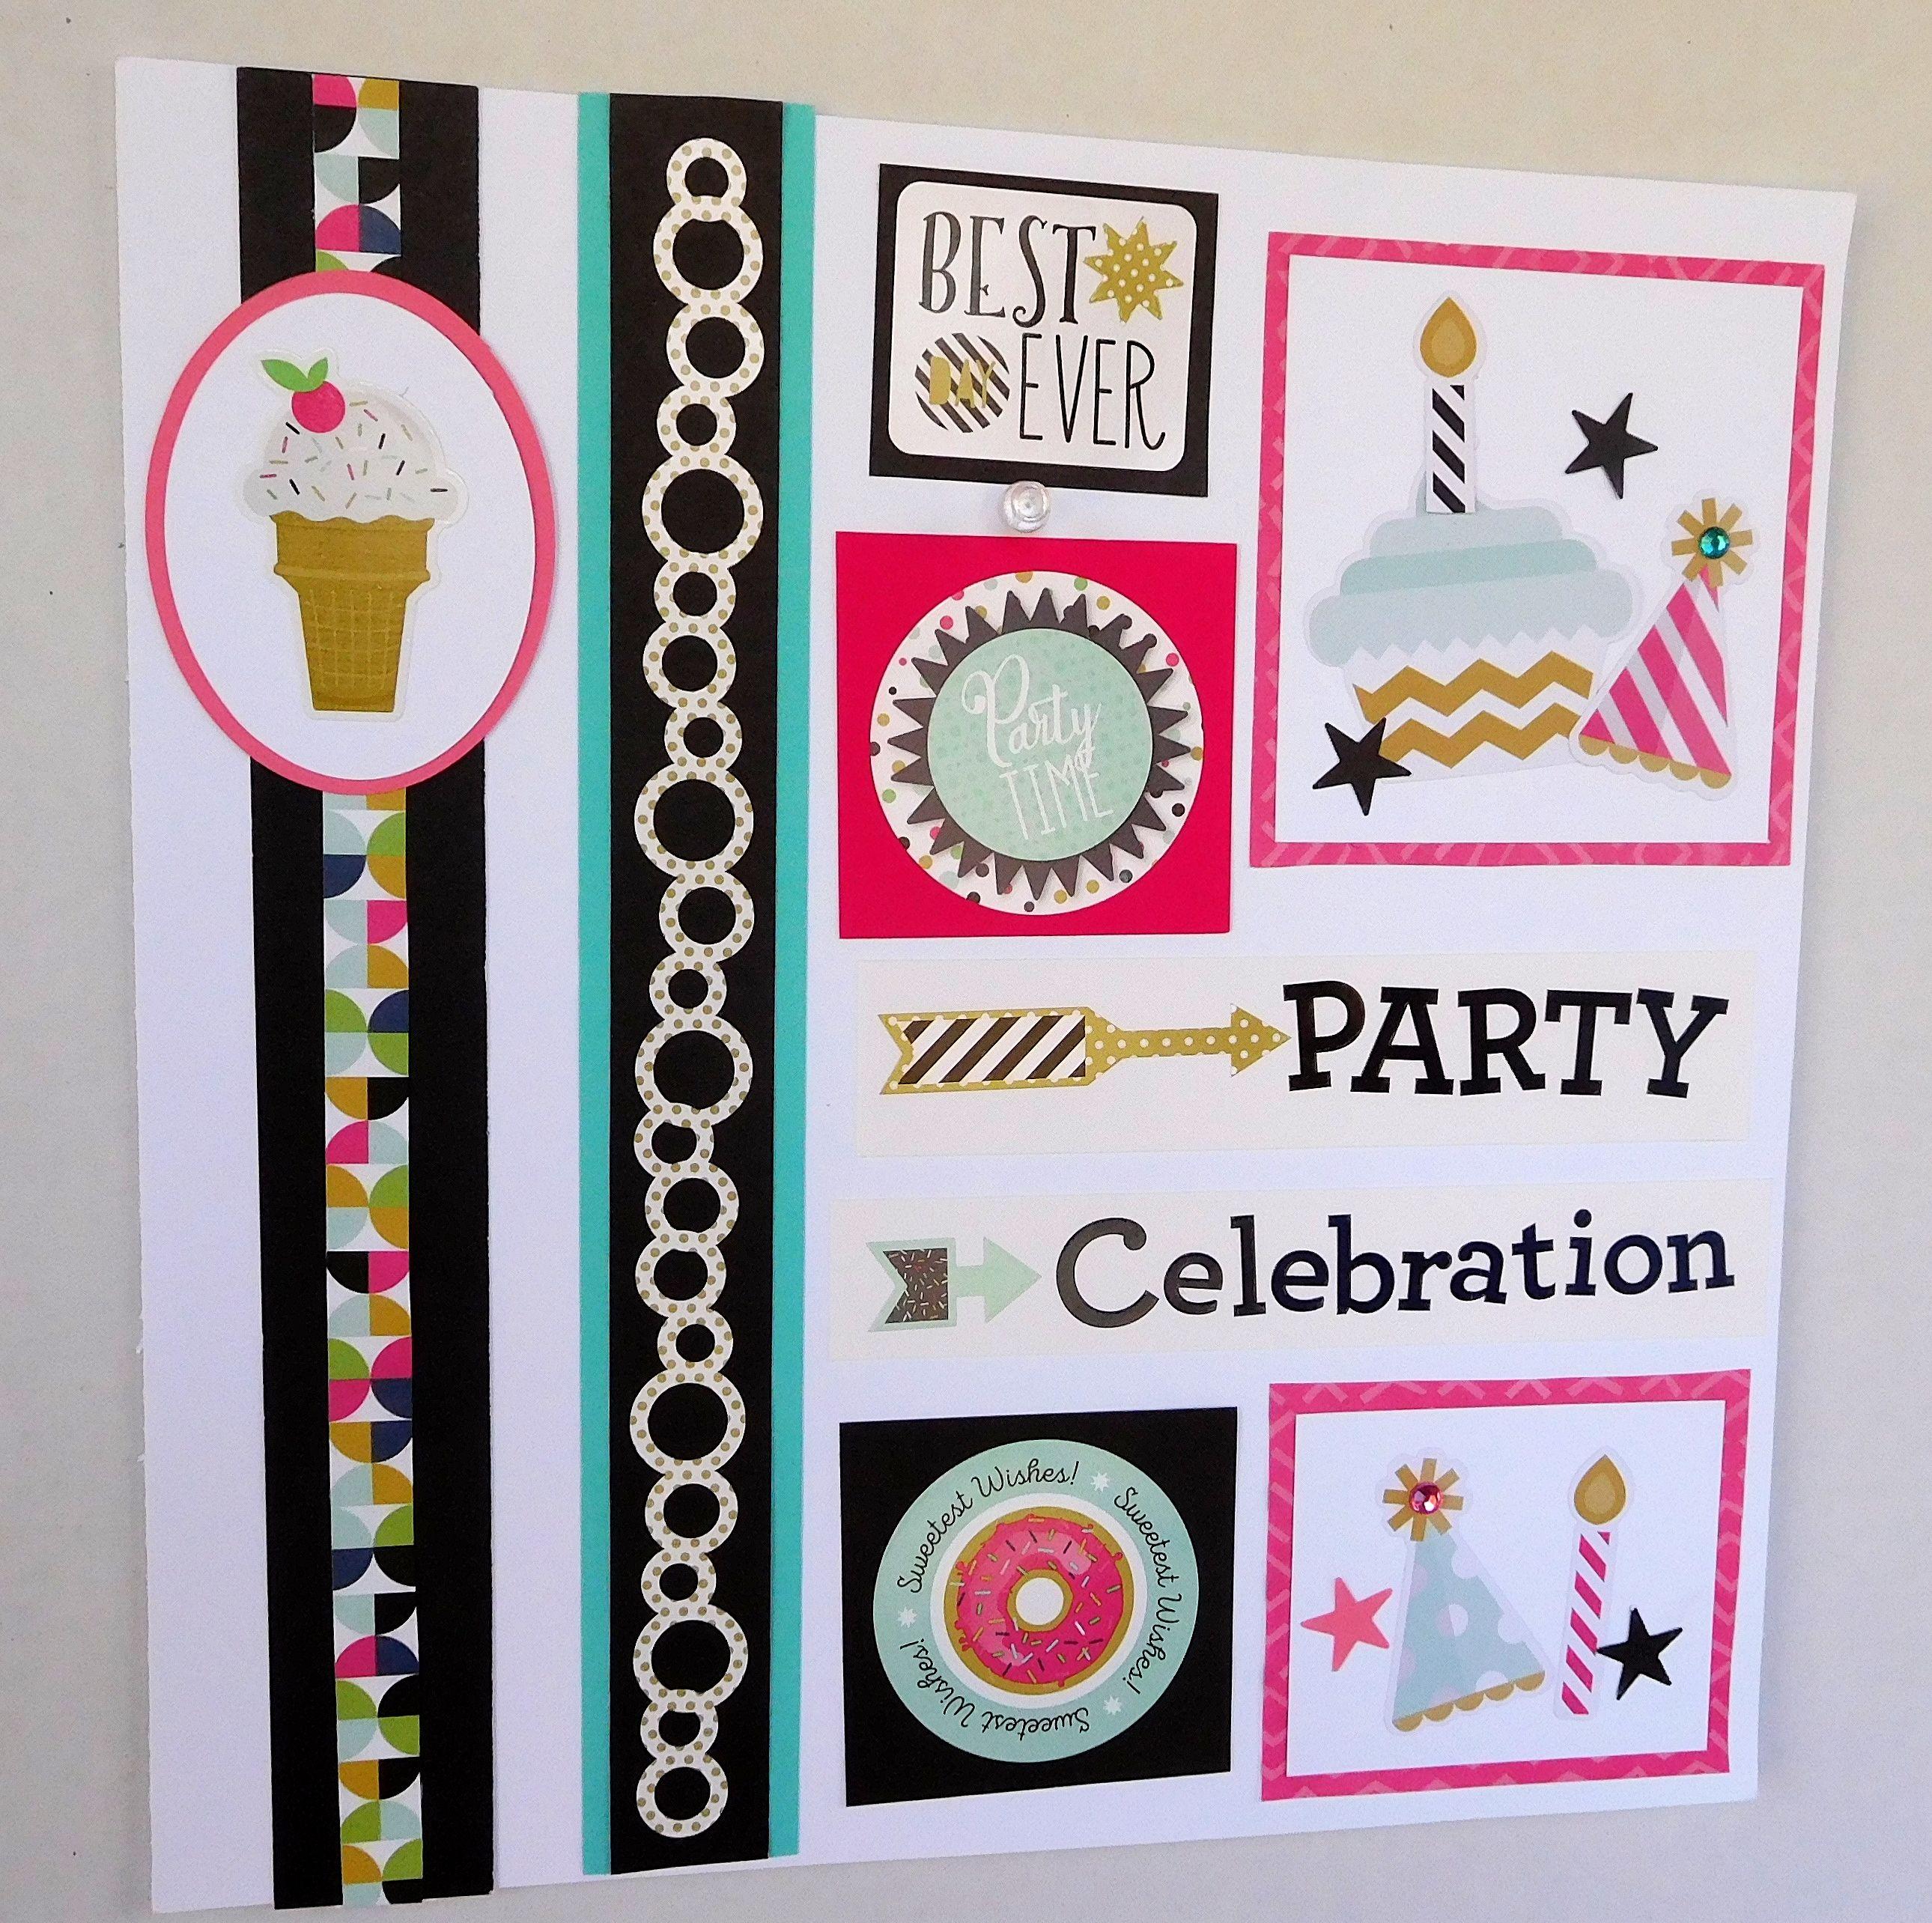 Scrapbook ideas creative memories - Creative Memories Scrapbook Ideas For Birthdays